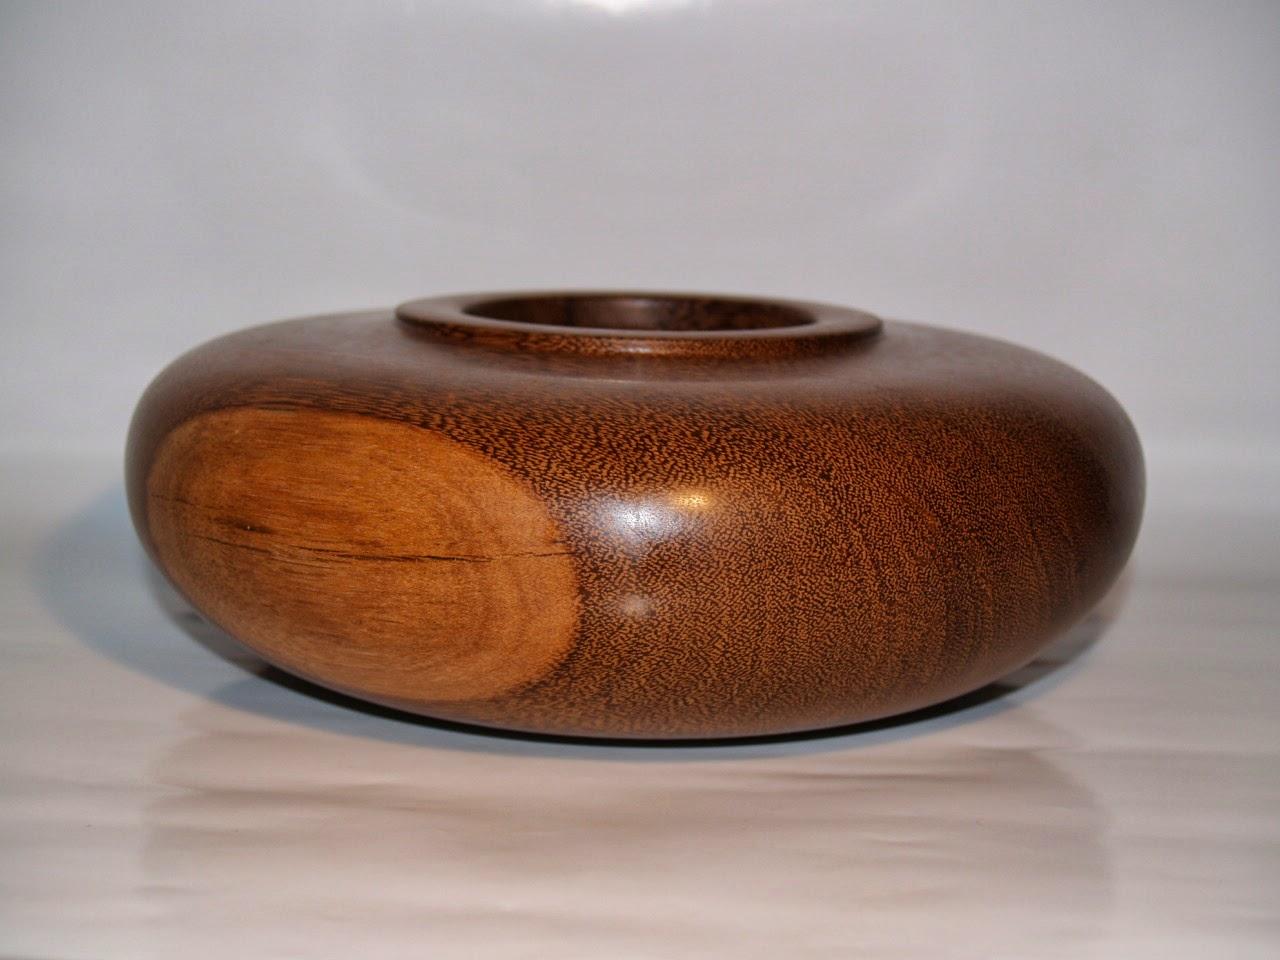 didier tournage sur bois pot en palmier du br sil. Black Bedroom Furniture Sets. Home Design Ideas